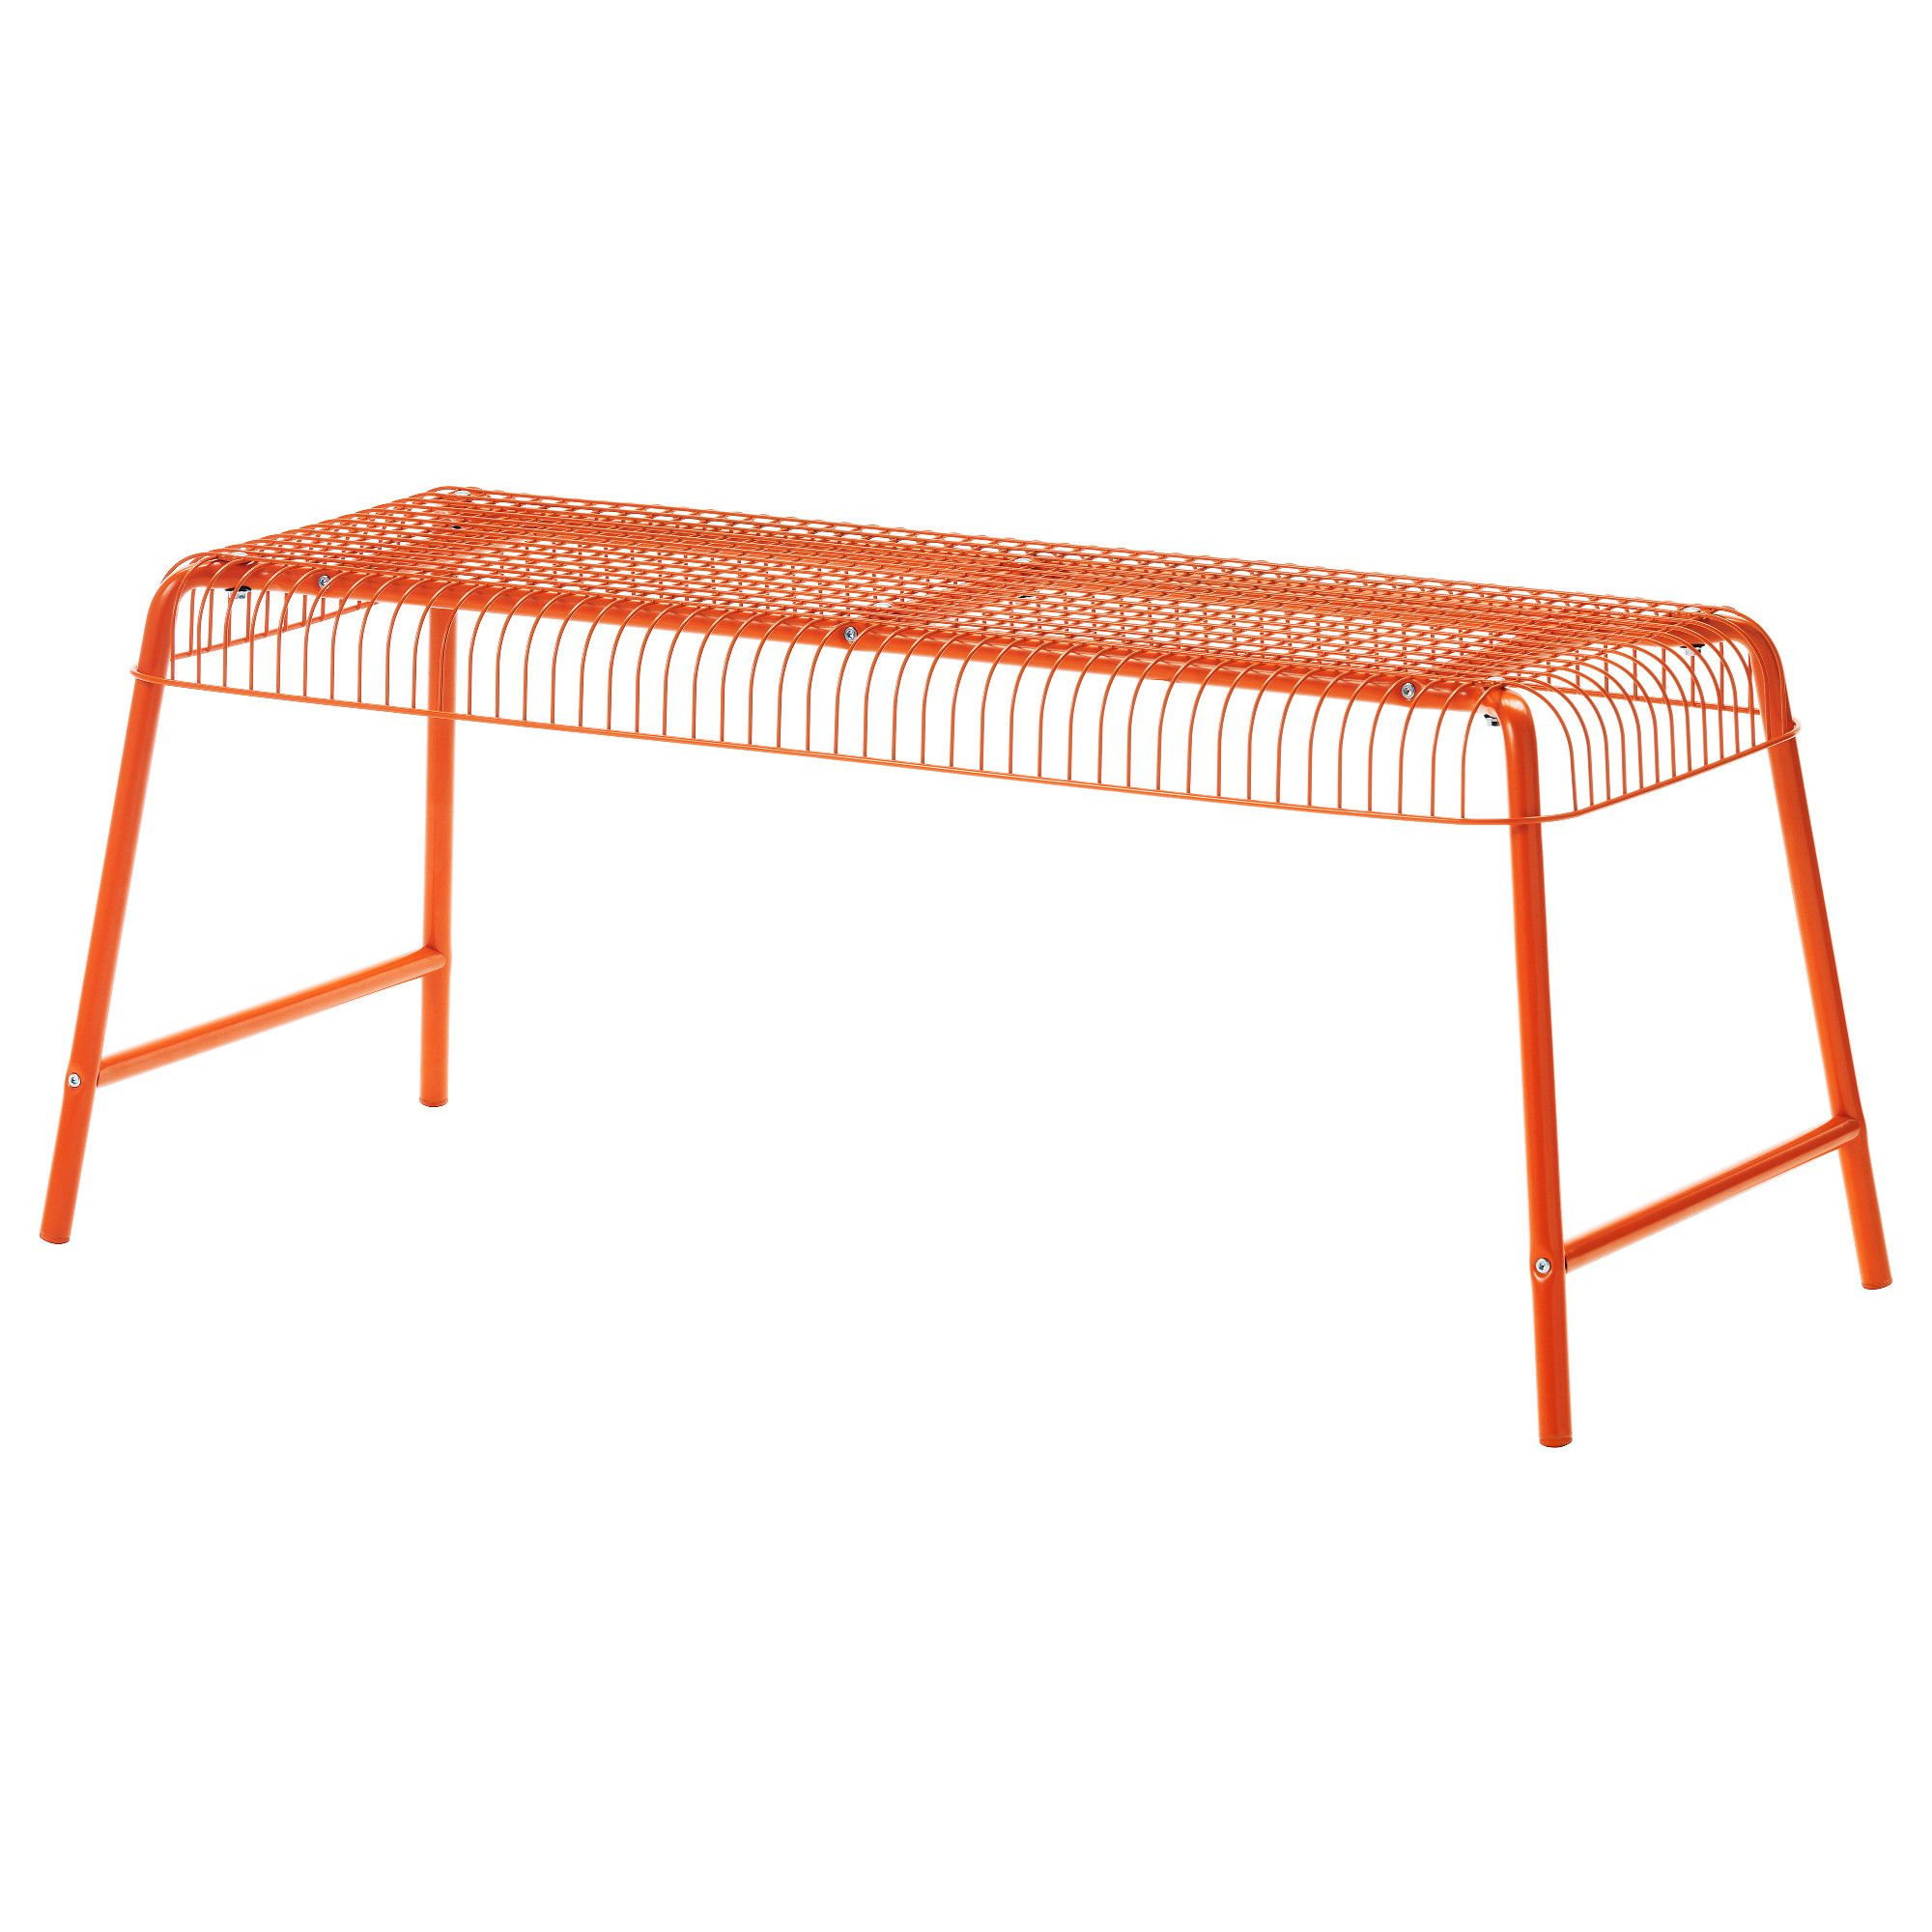 Västerön Banc Intérieurextérieur Orange Patio Ikea